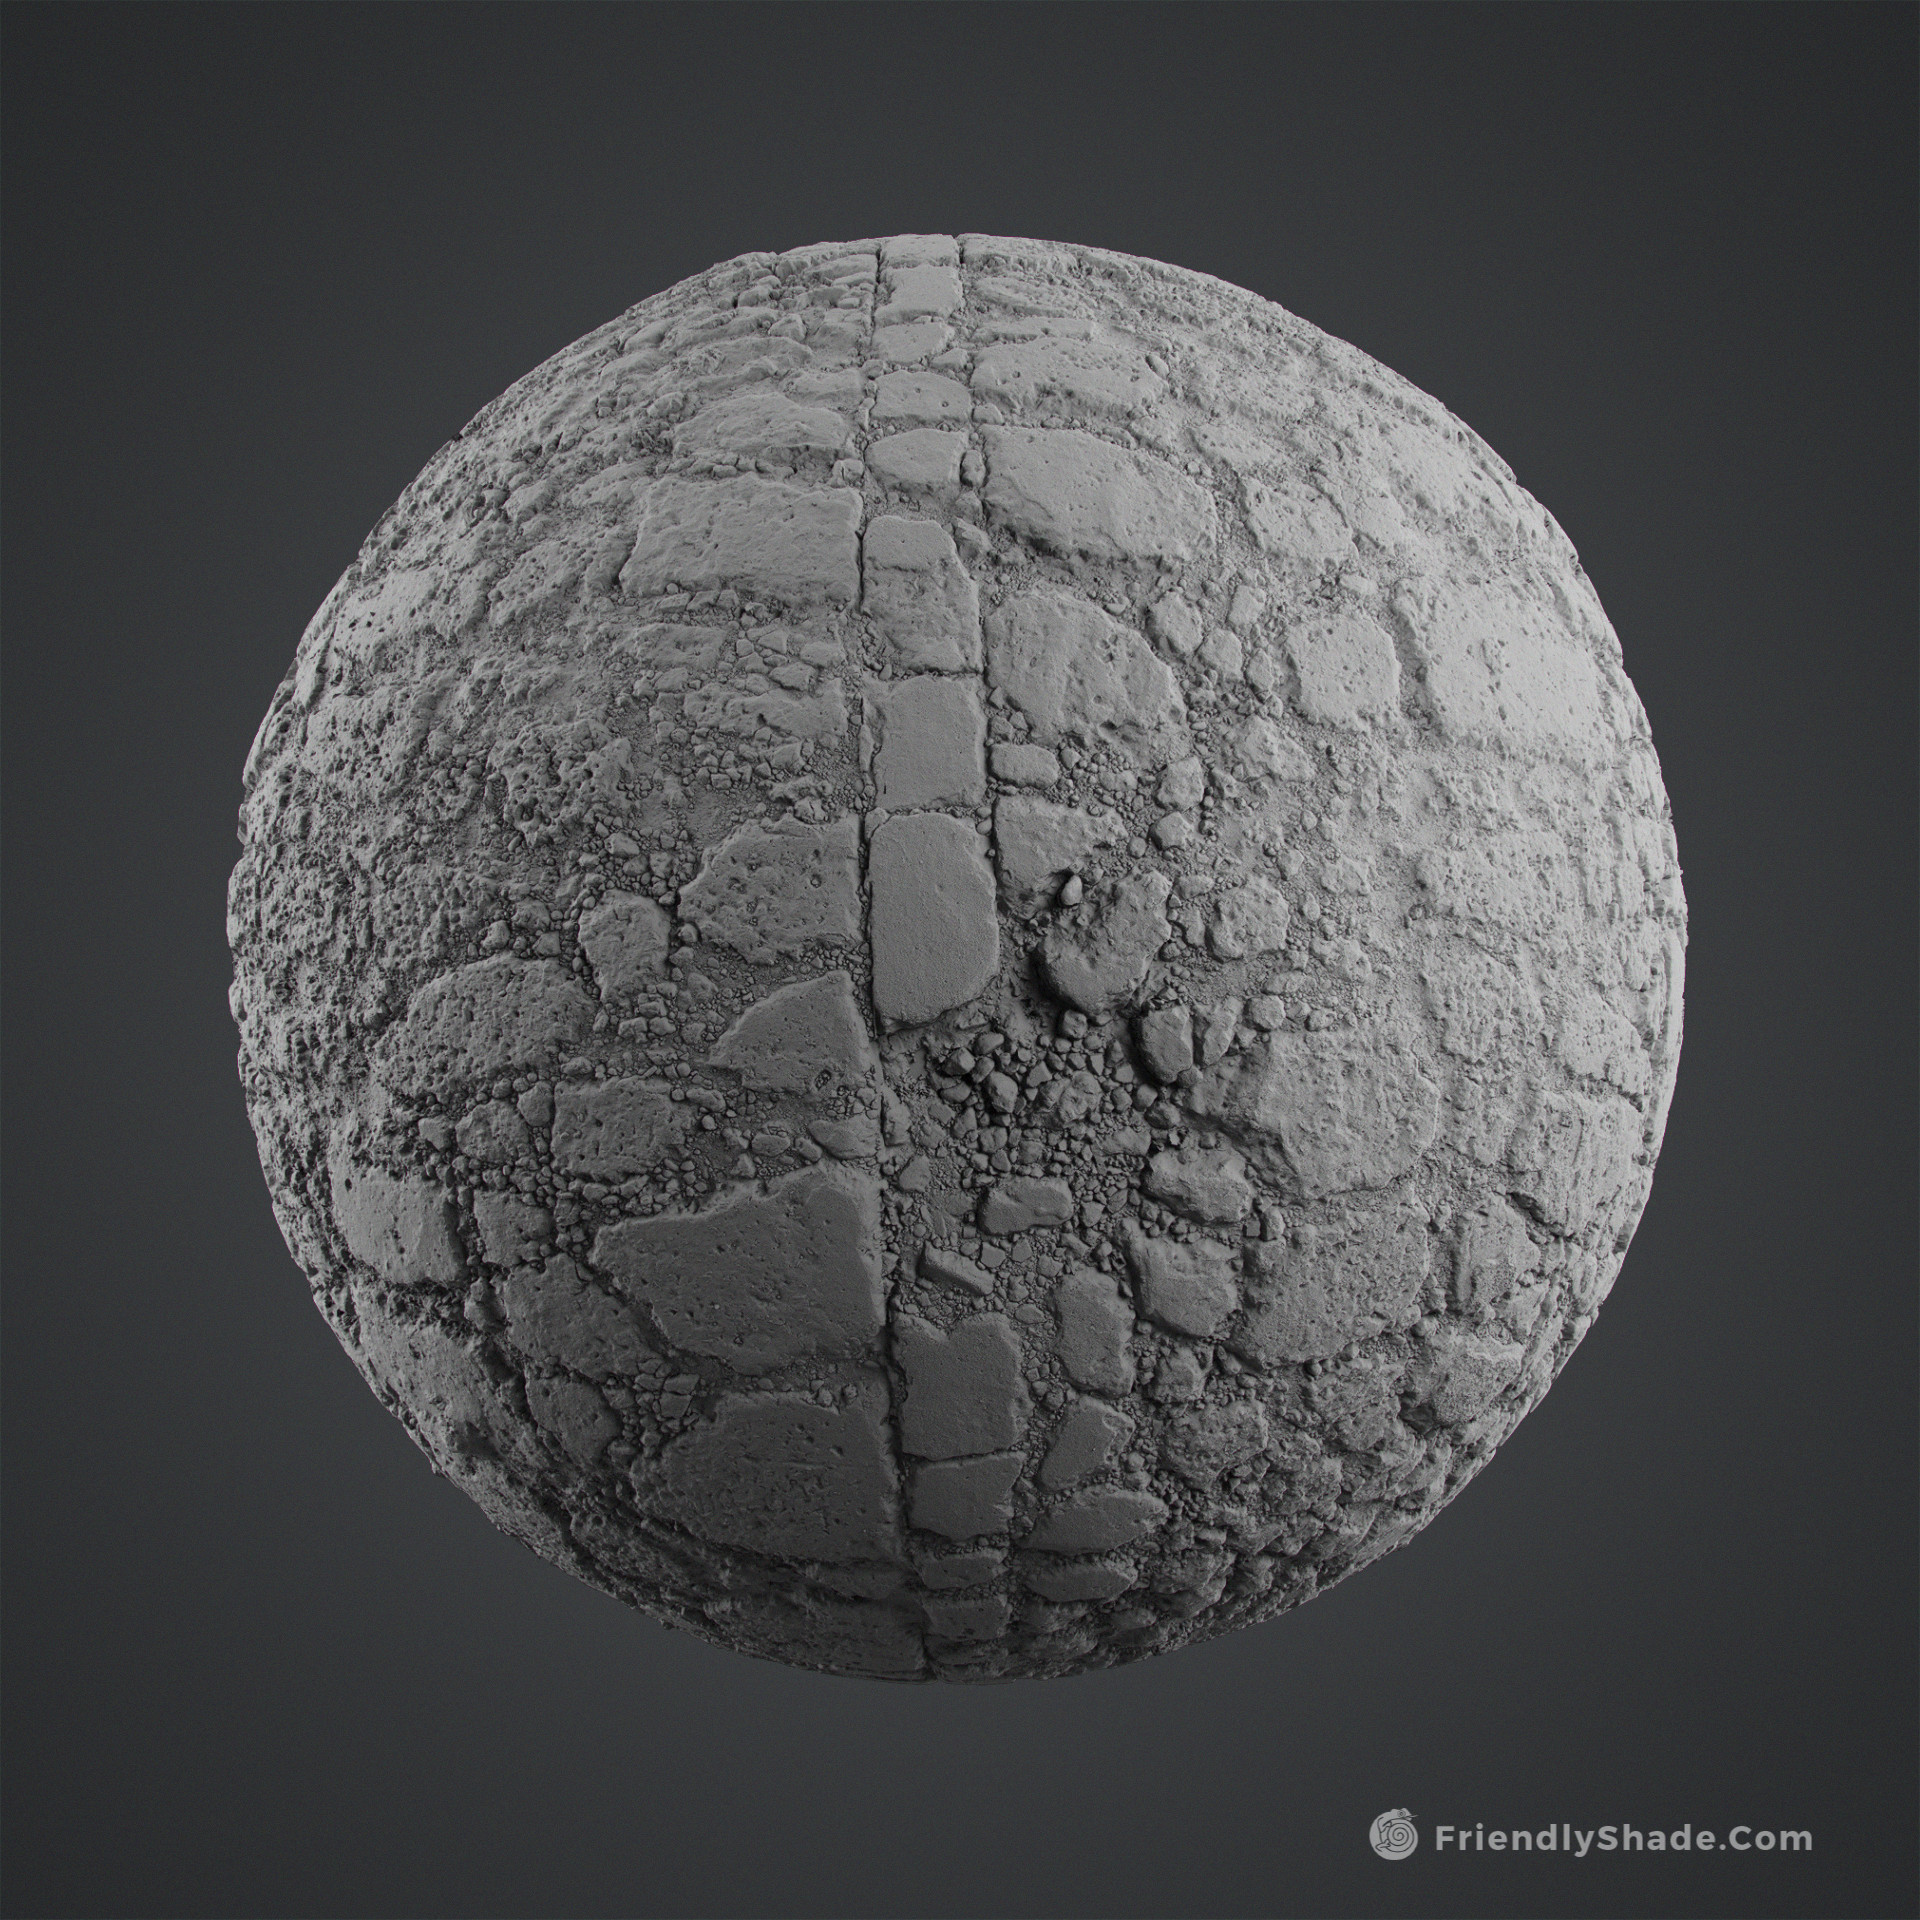 https://cdna.artstation.com/p/assets/images/images/007/233/292/large/sebastian-zapata-sphere-clay-post.jpg?1504648731